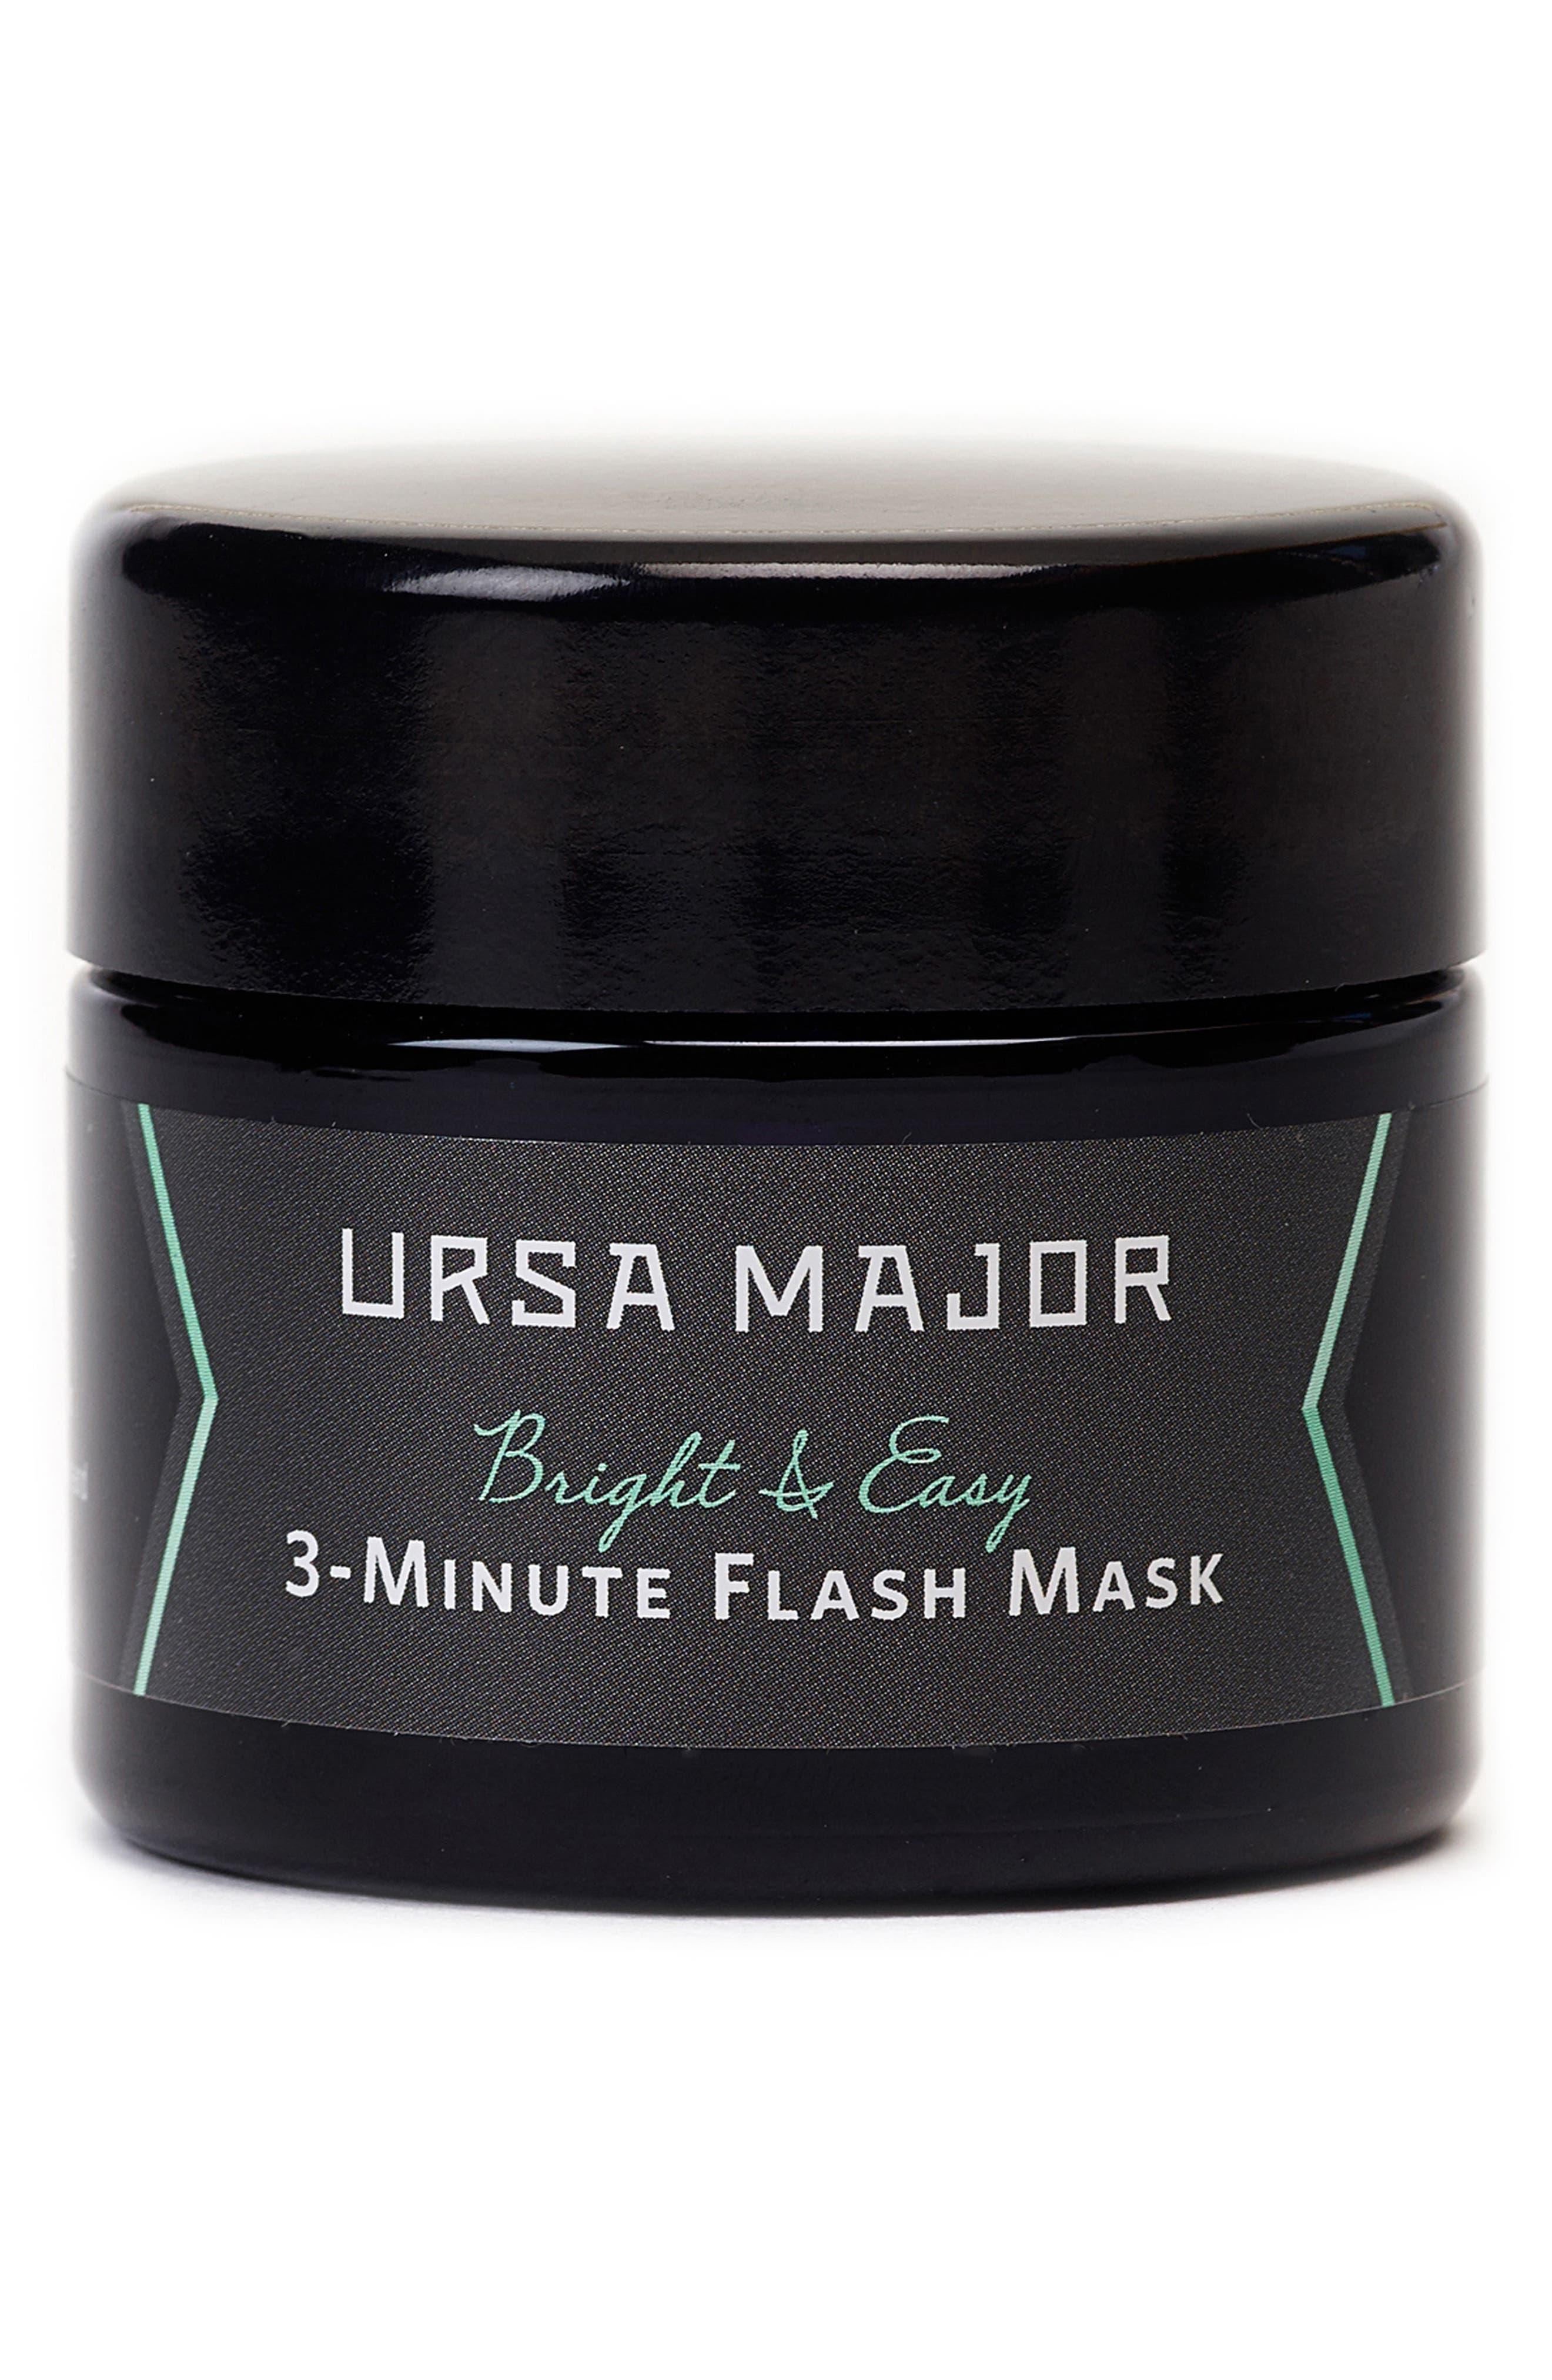 Bright & Easy 3-Minute Flash Mask,                             Main thumbnail 1, color,                             NO COLOR